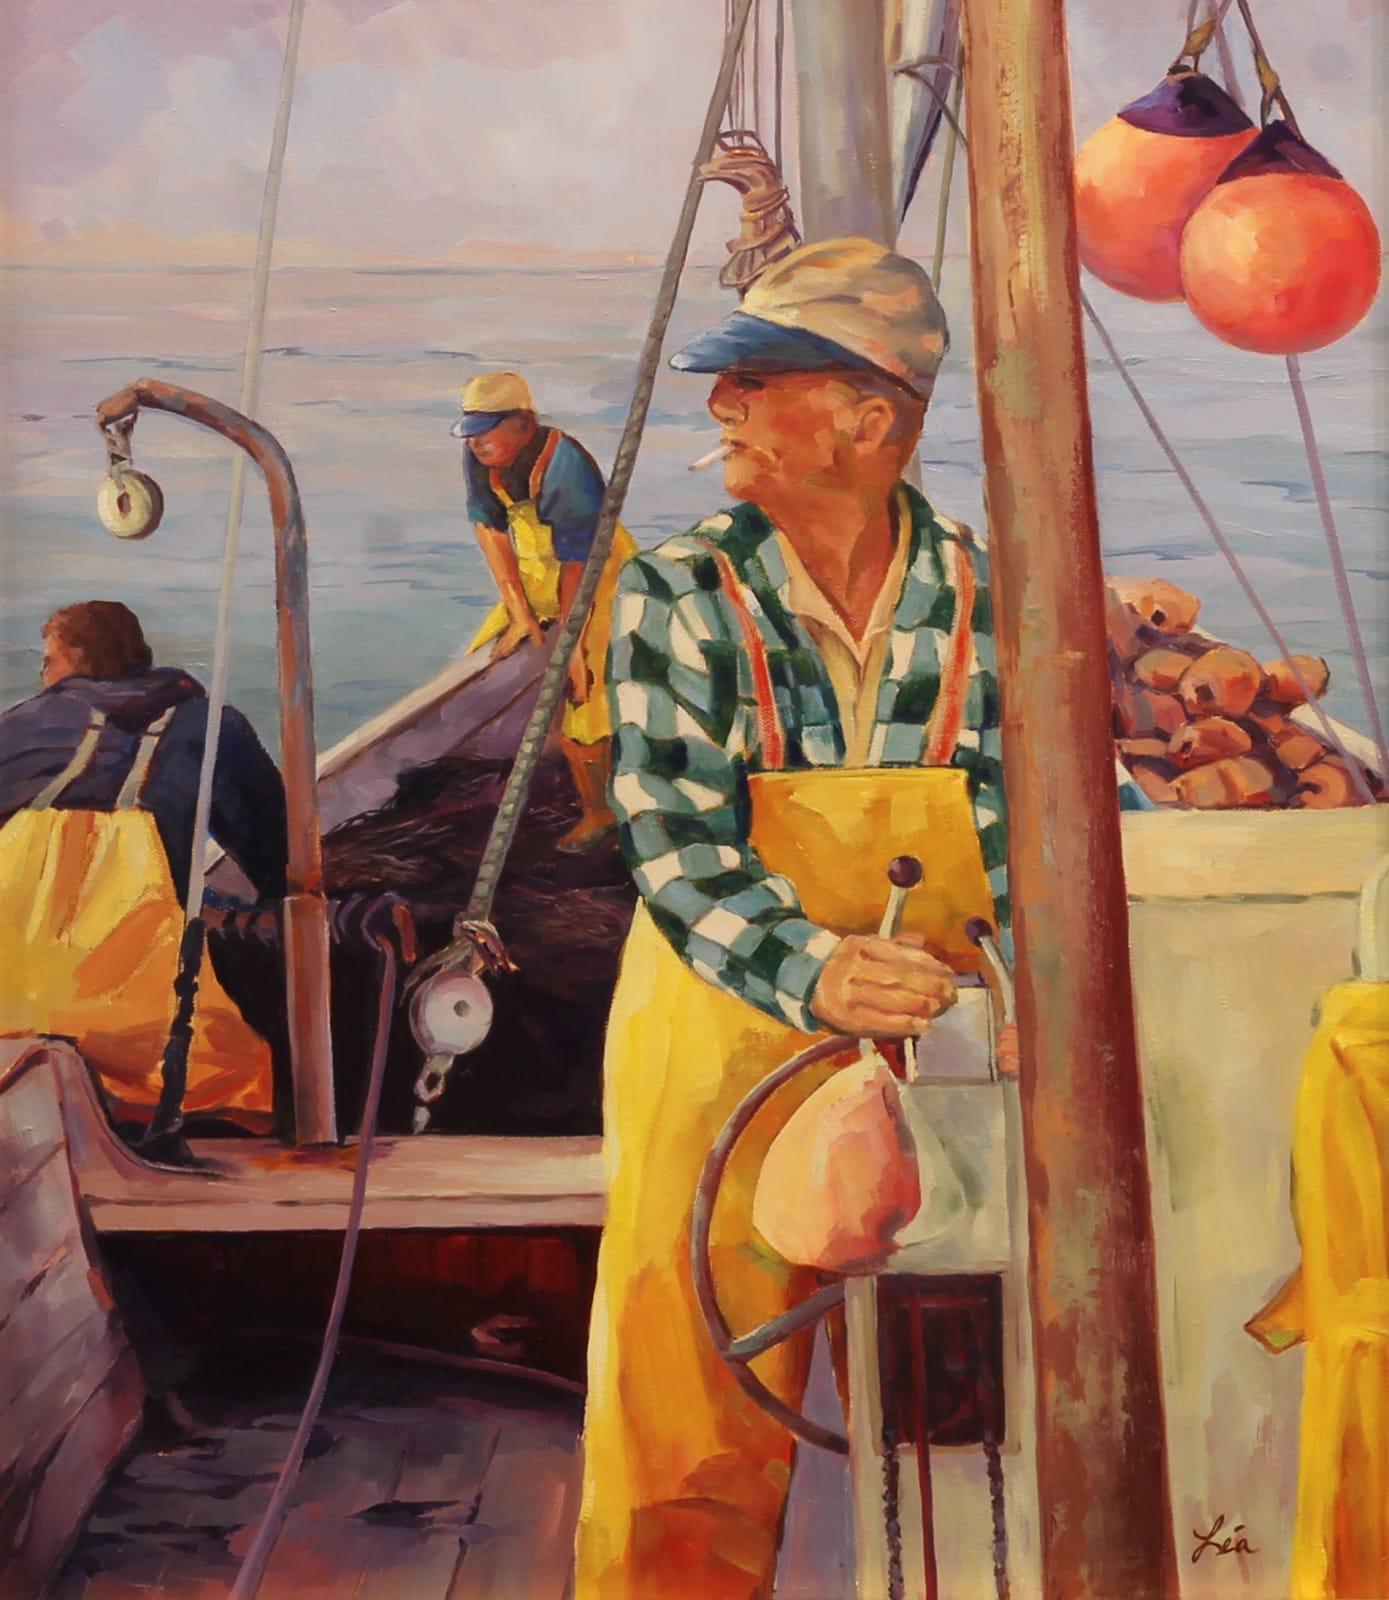 Lea Peterson: Working the Coast